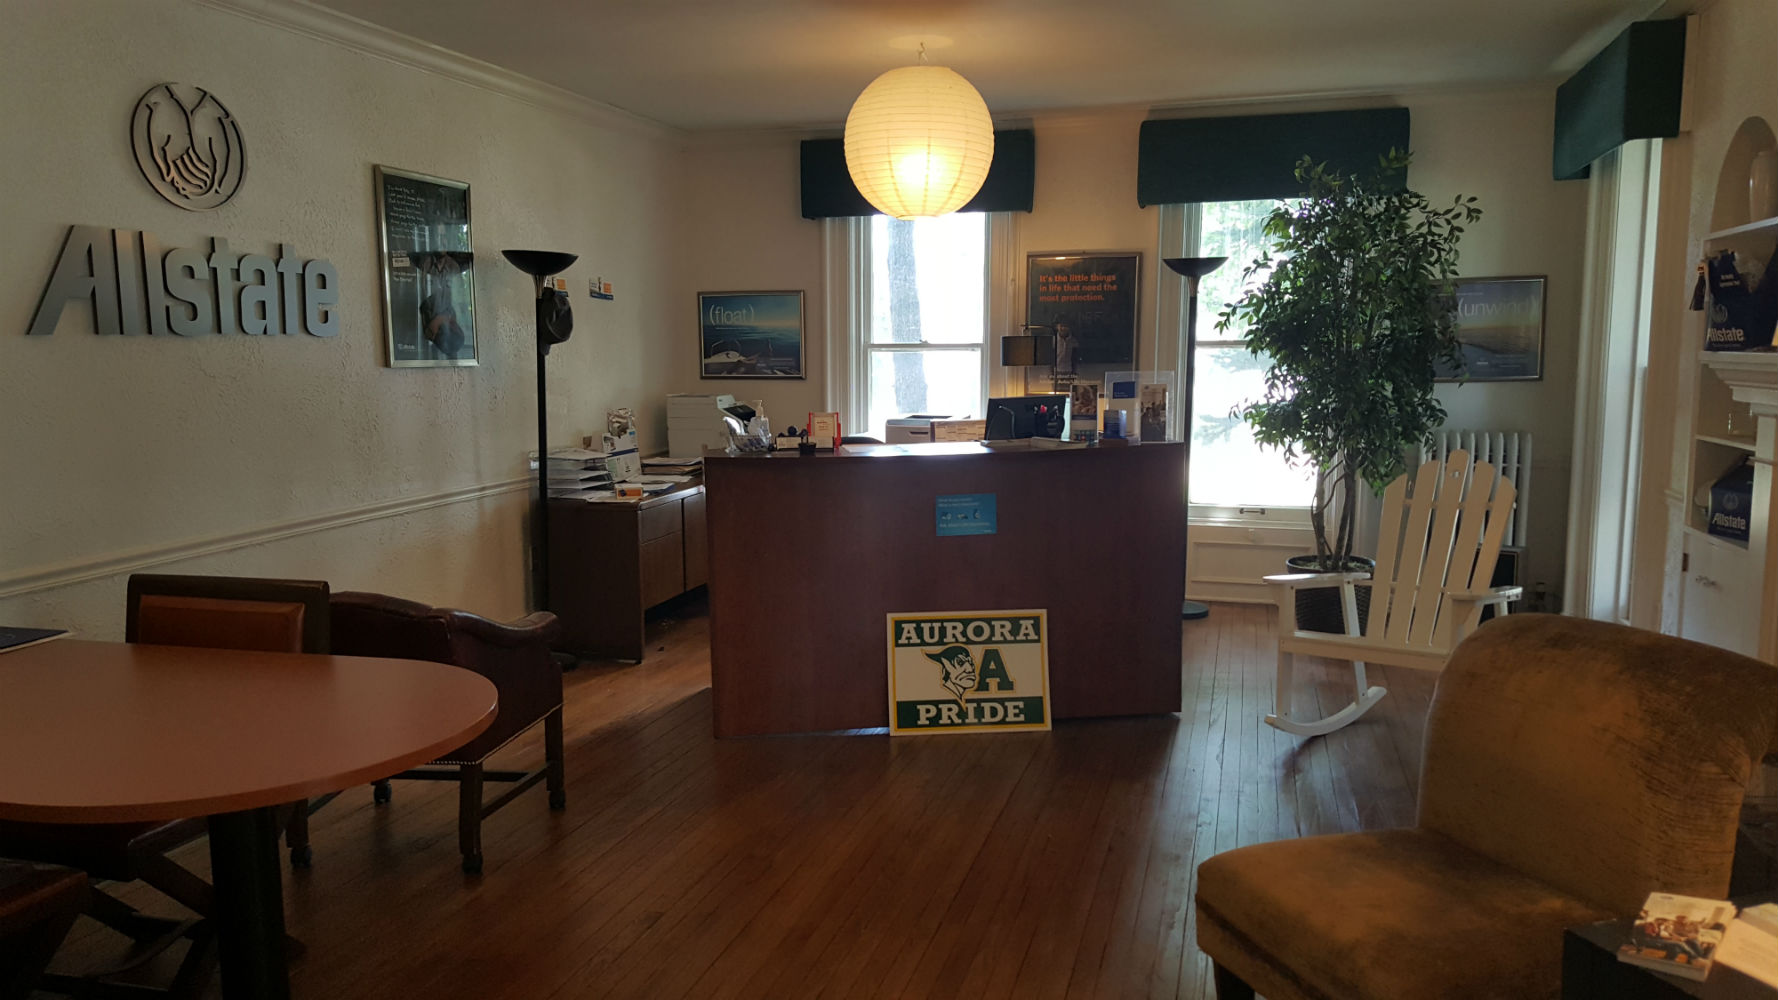 Thomas Peel: Allstate Insurance image 5